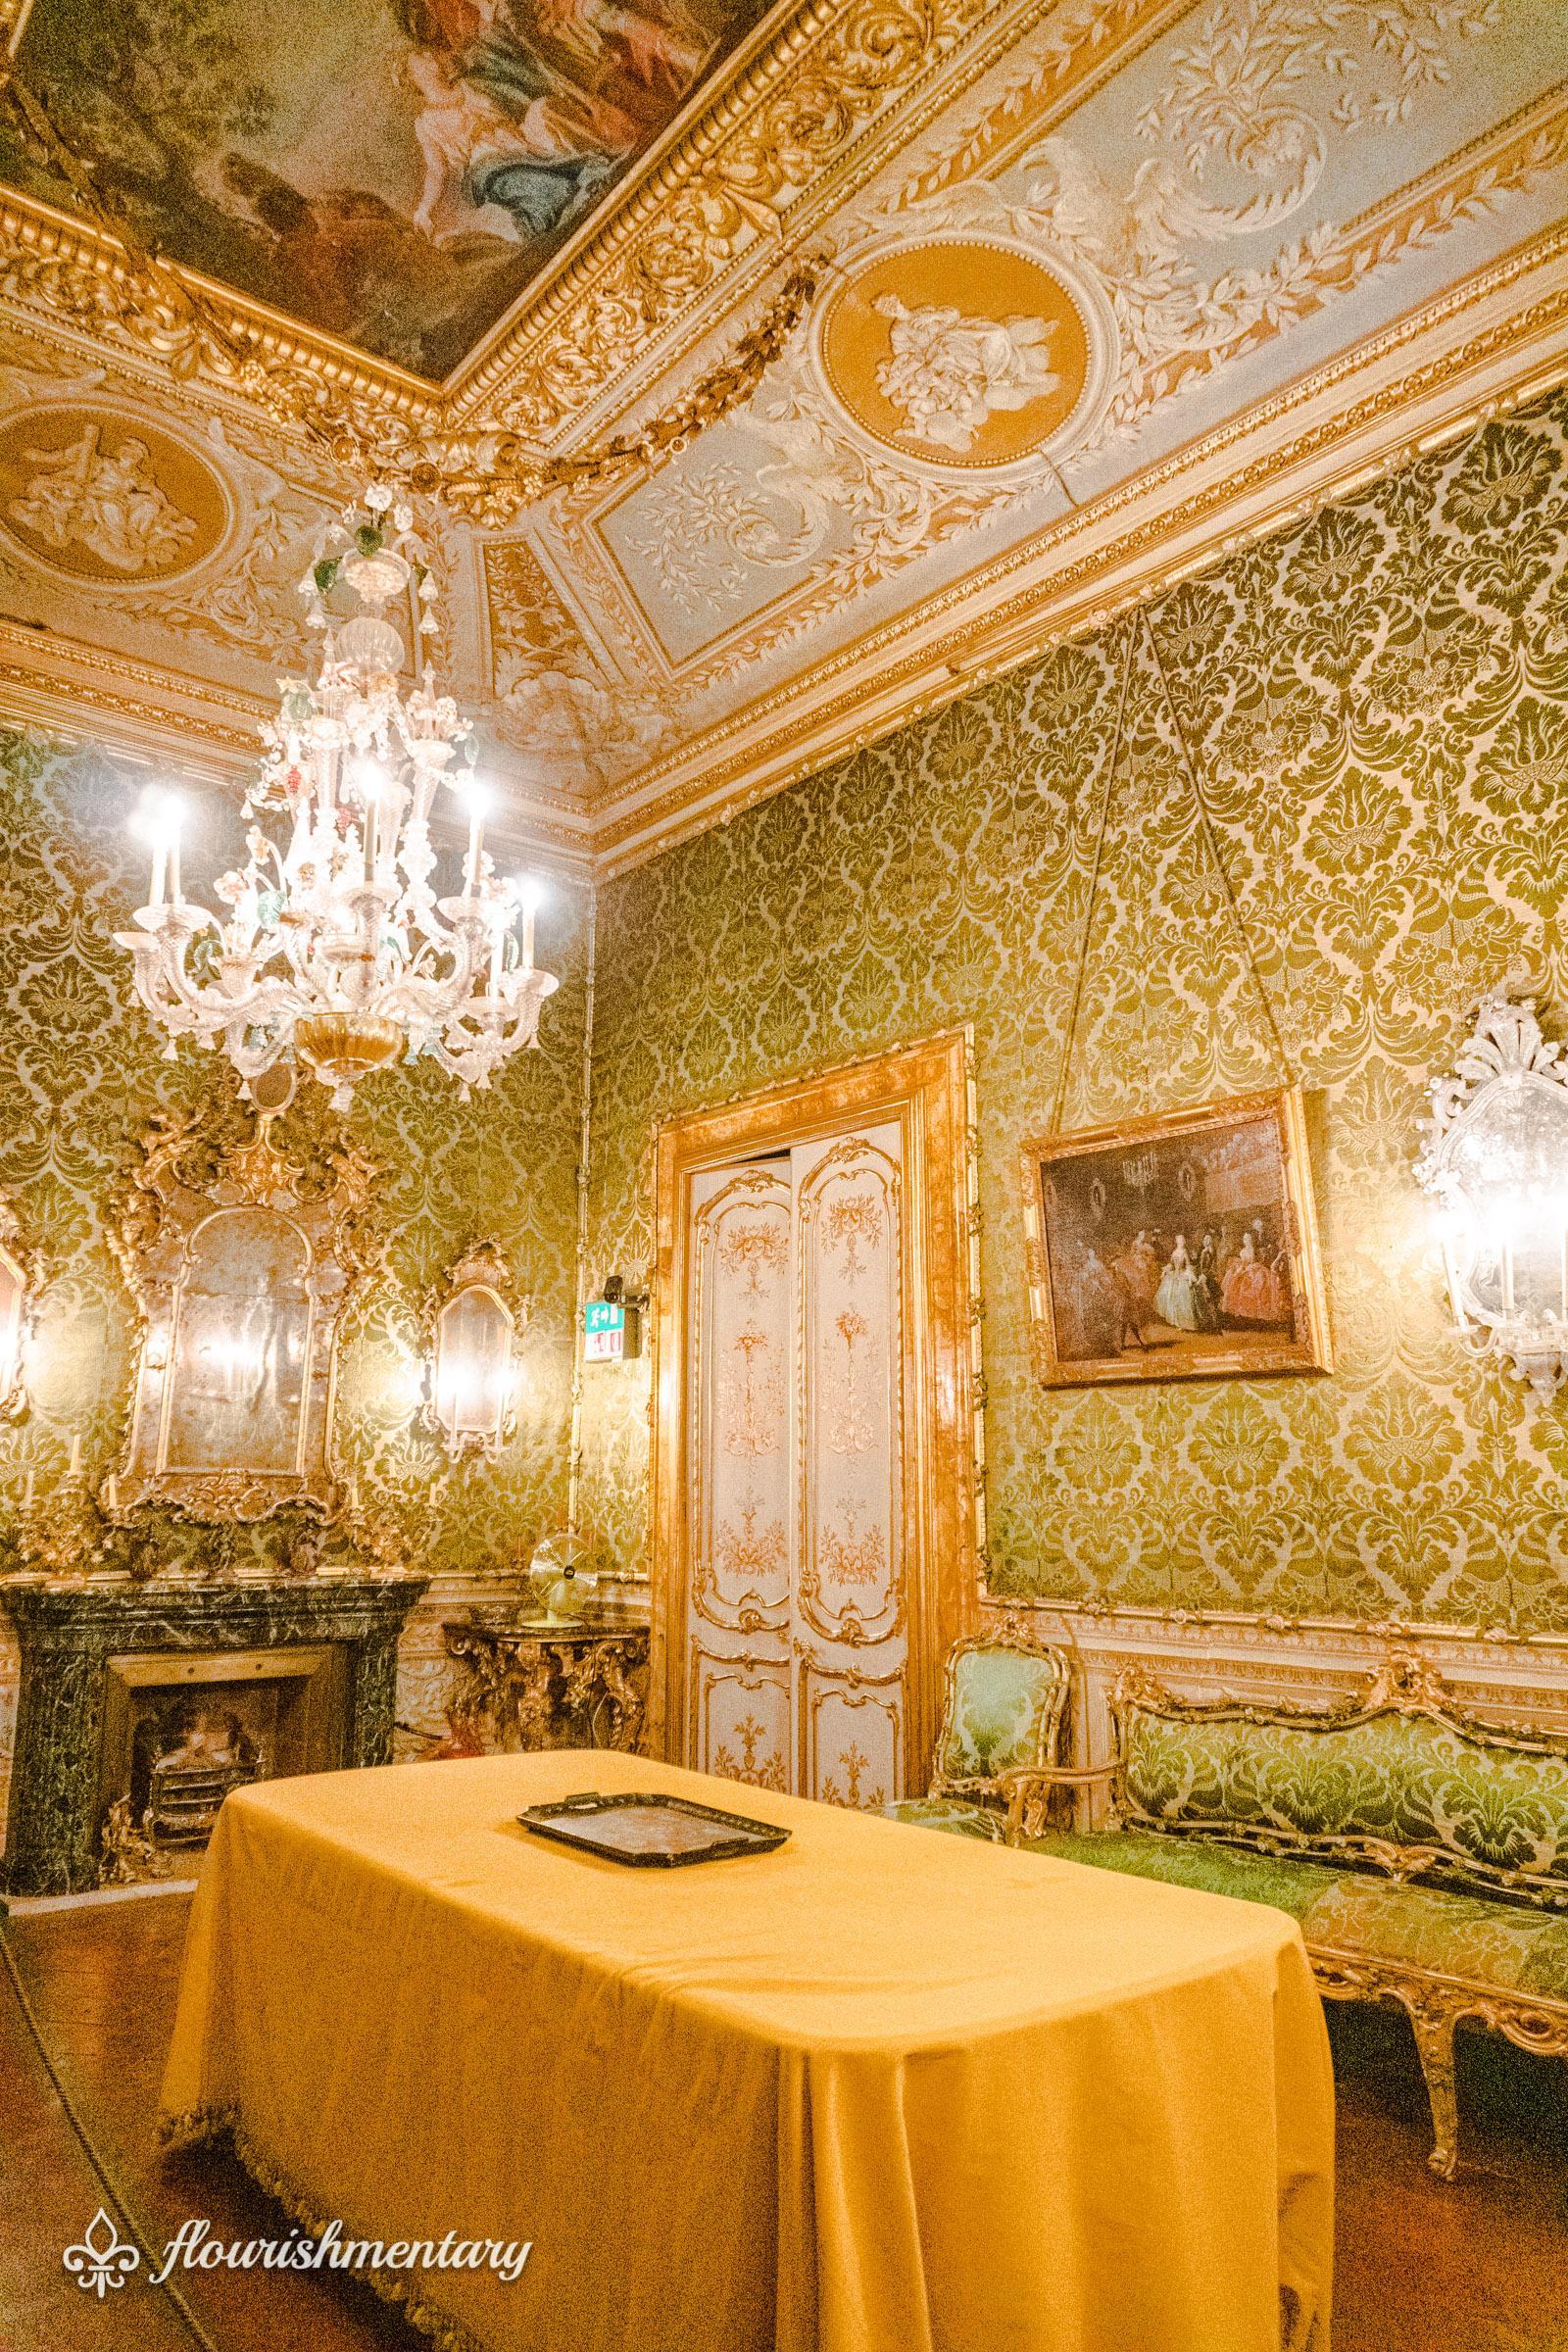 The Venetian Room galleria doria pamphilj